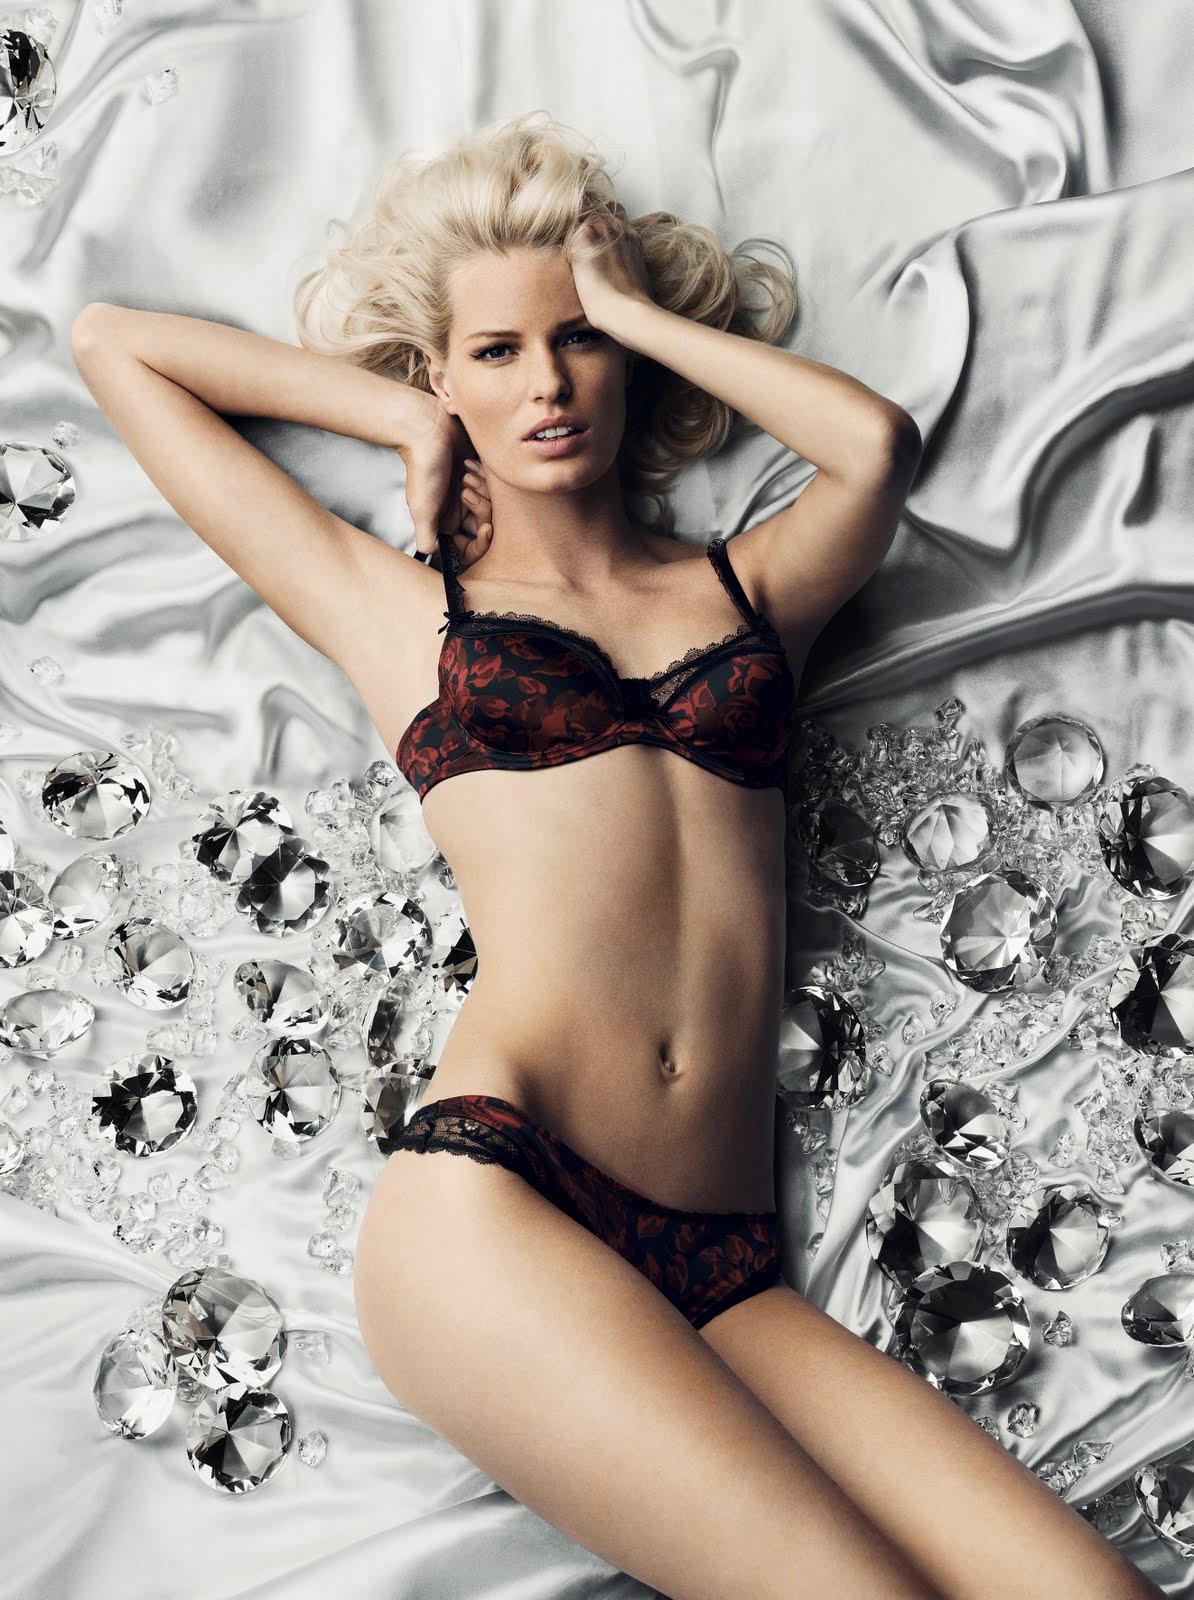 Paparazzi Caroline Winberg nude (56 photo), Pussy, Sideboobs, Feet, panties 2019